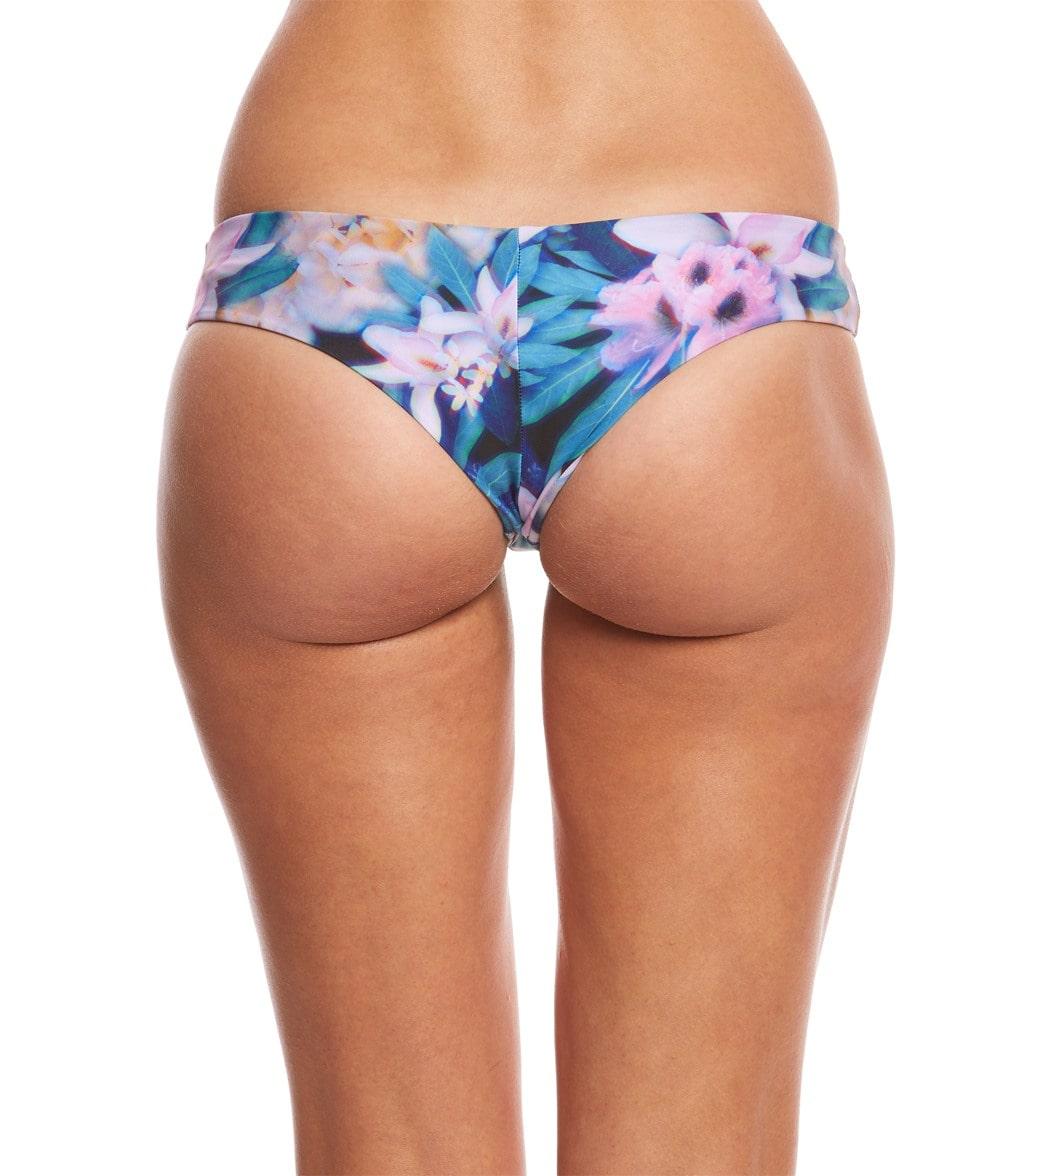 d8d5bba529592 Stone Fox Swim Wonderland Jessie Bikini Bottom at SwimOutlet.com - Free  Shipping